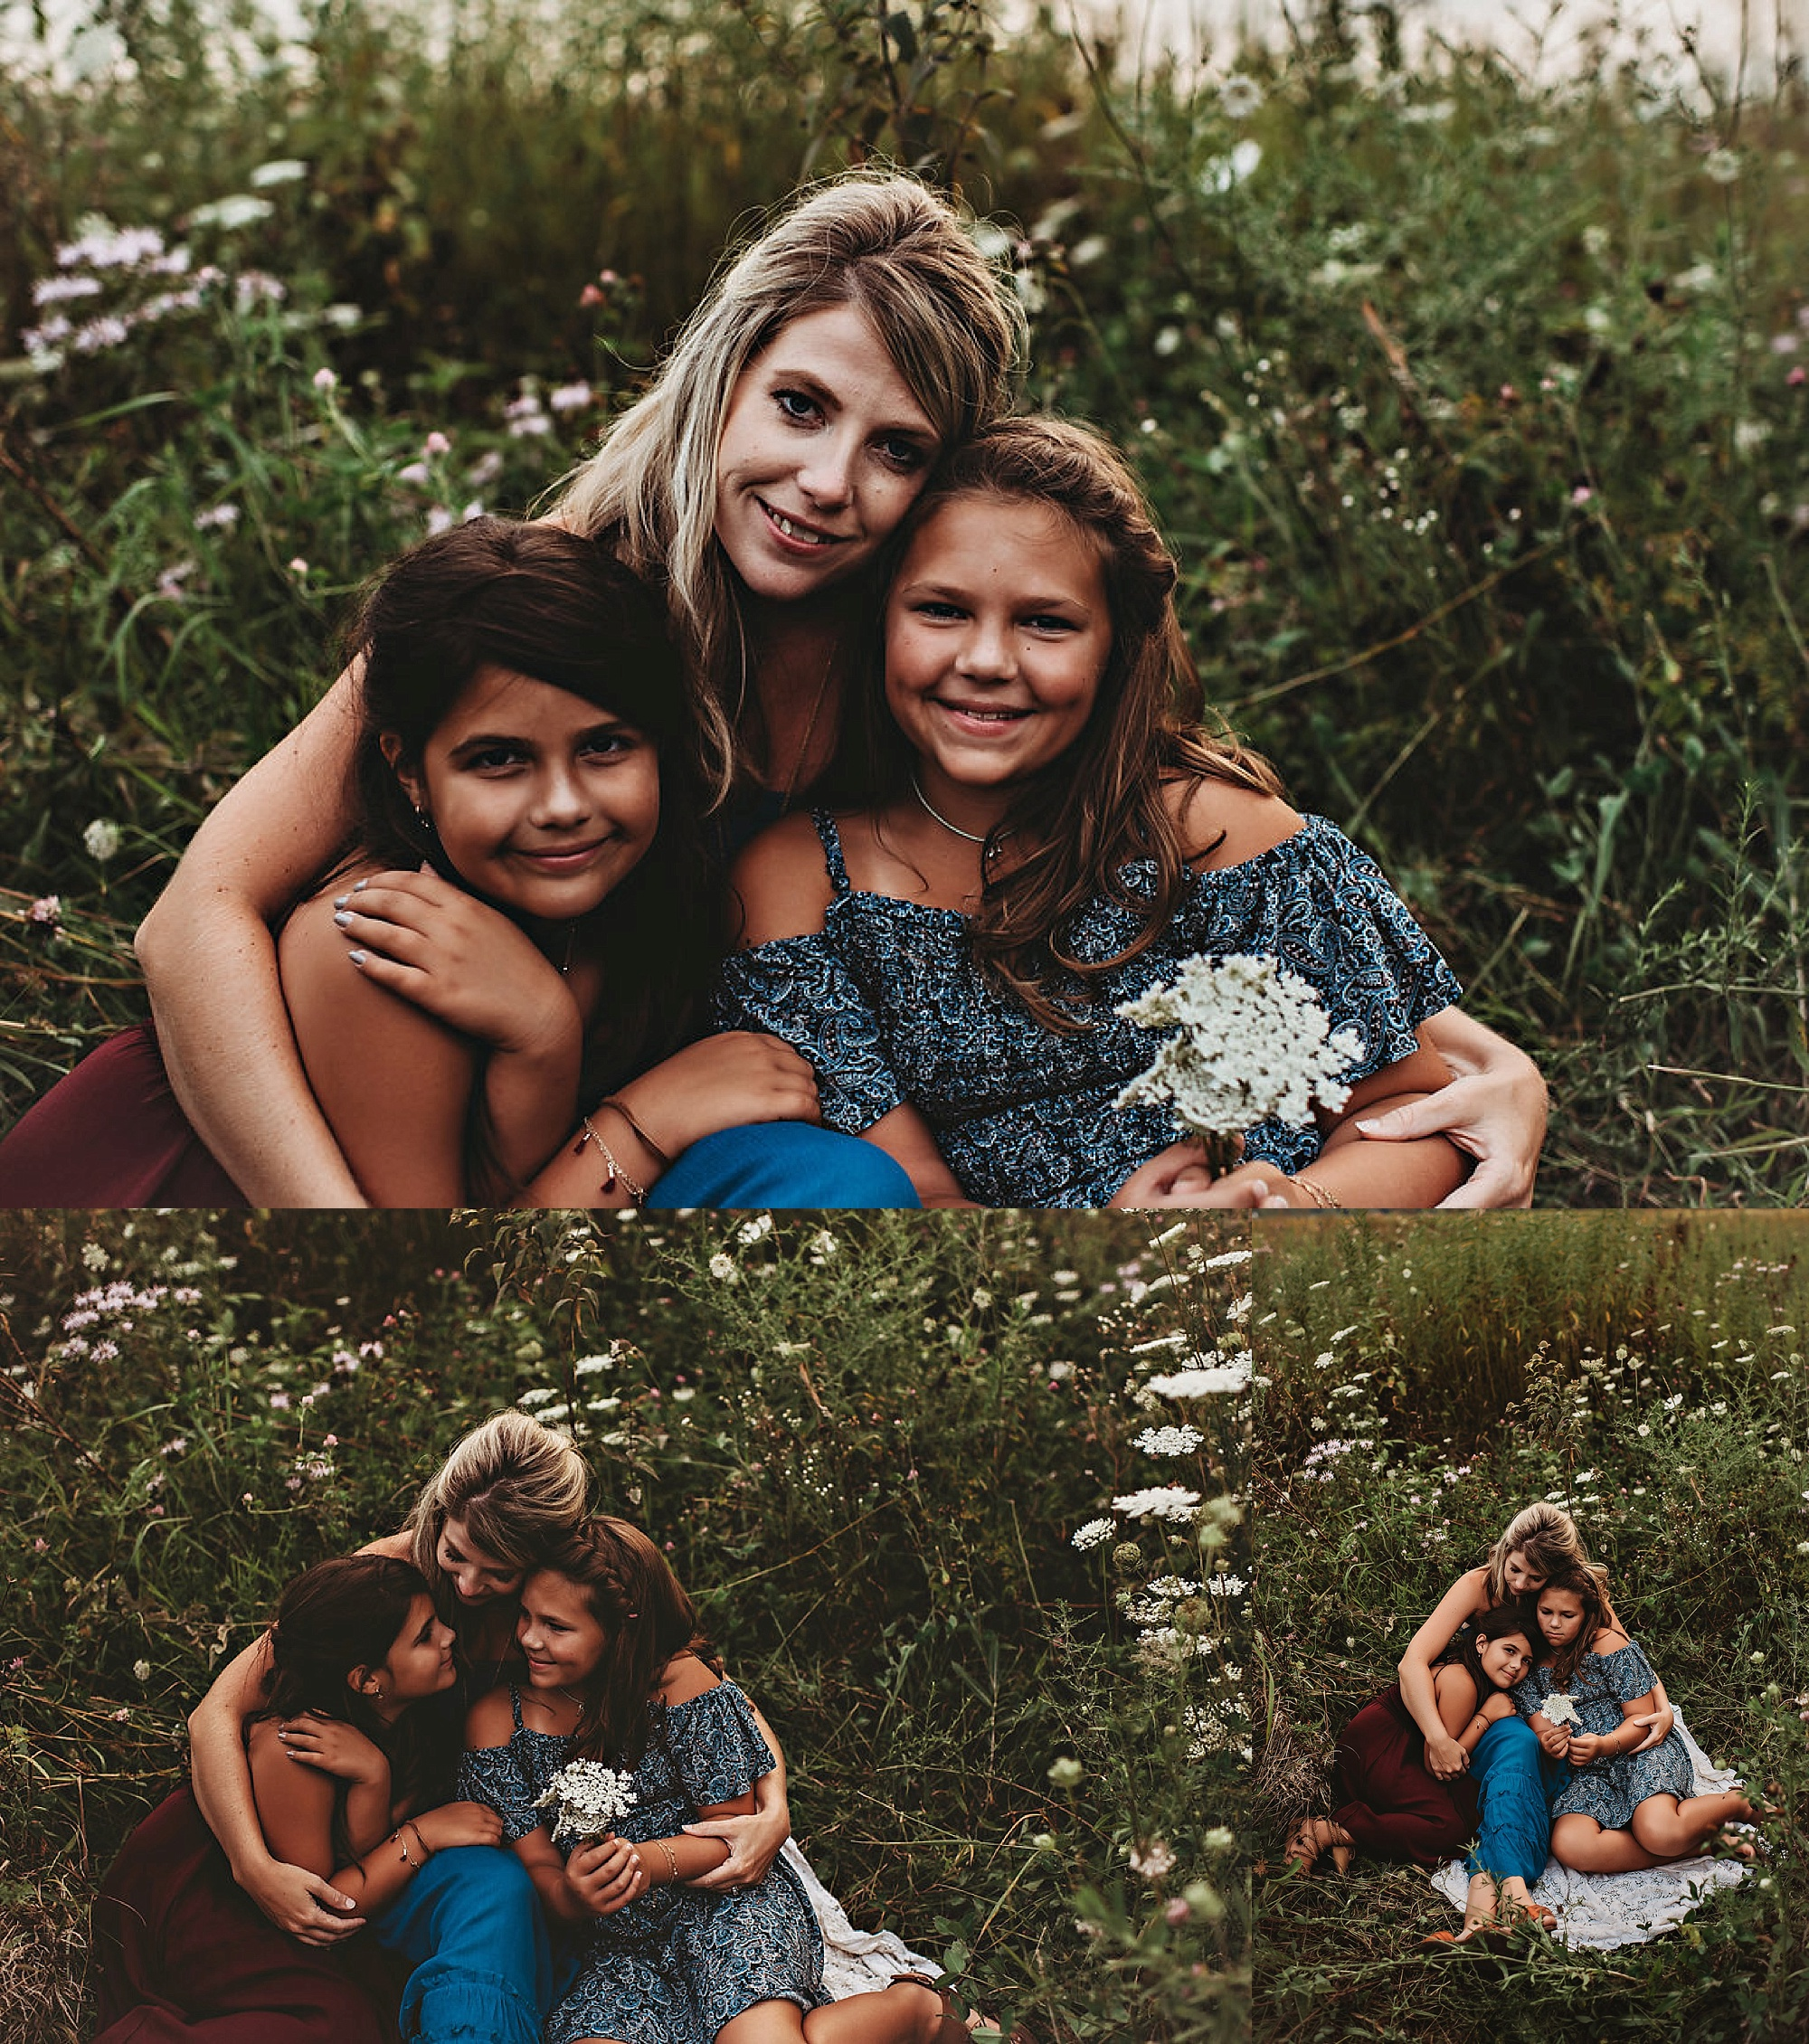 mcfredrick-family-lauren-grayson-akron-ohio_0030.jpg